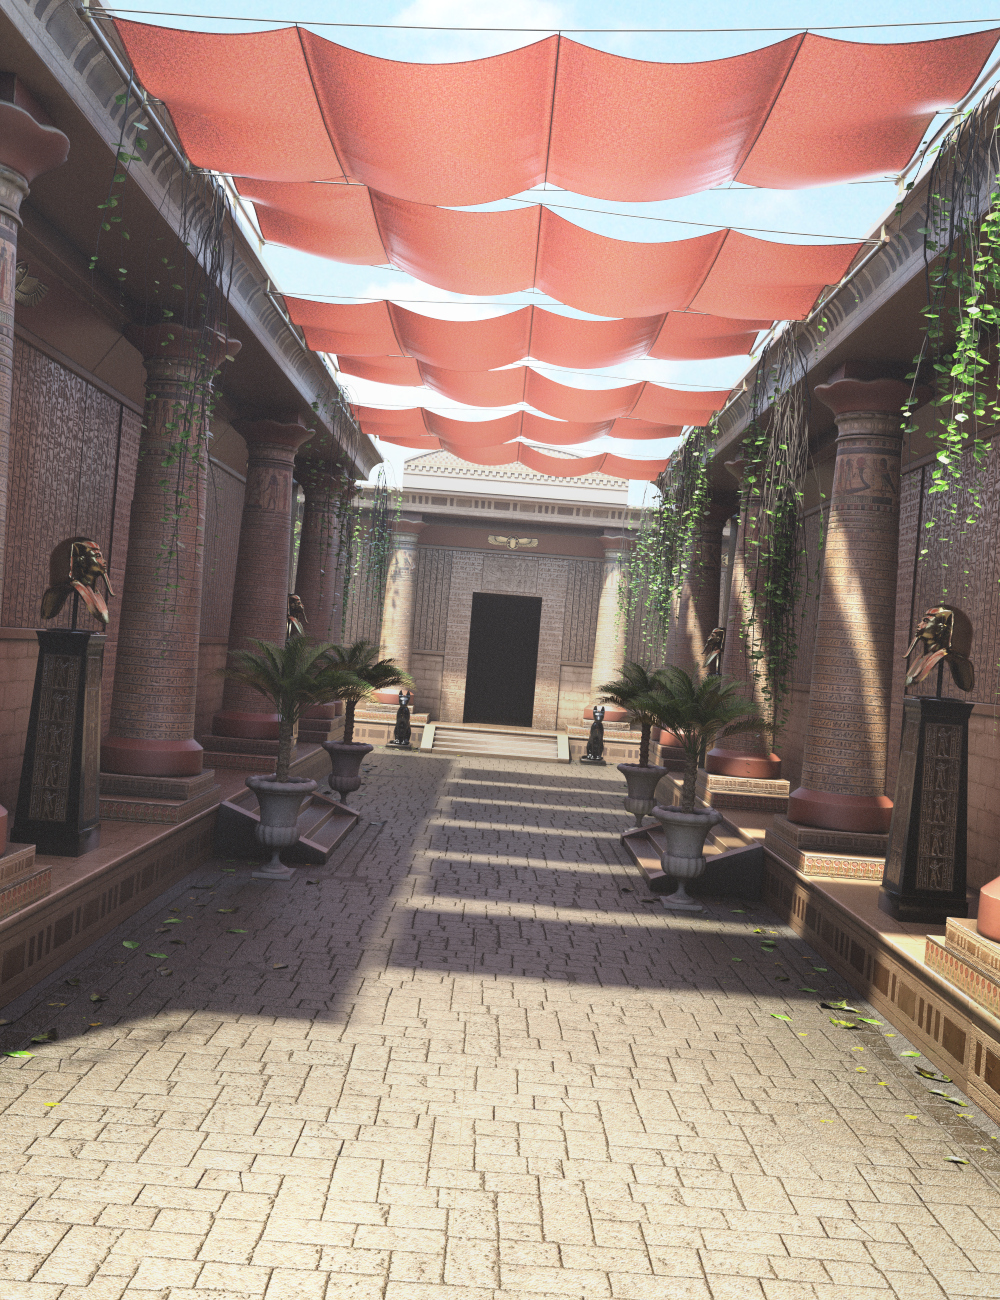 Hypostyle Hallway by: Merlin Studios, 3D Models by Daz 3D